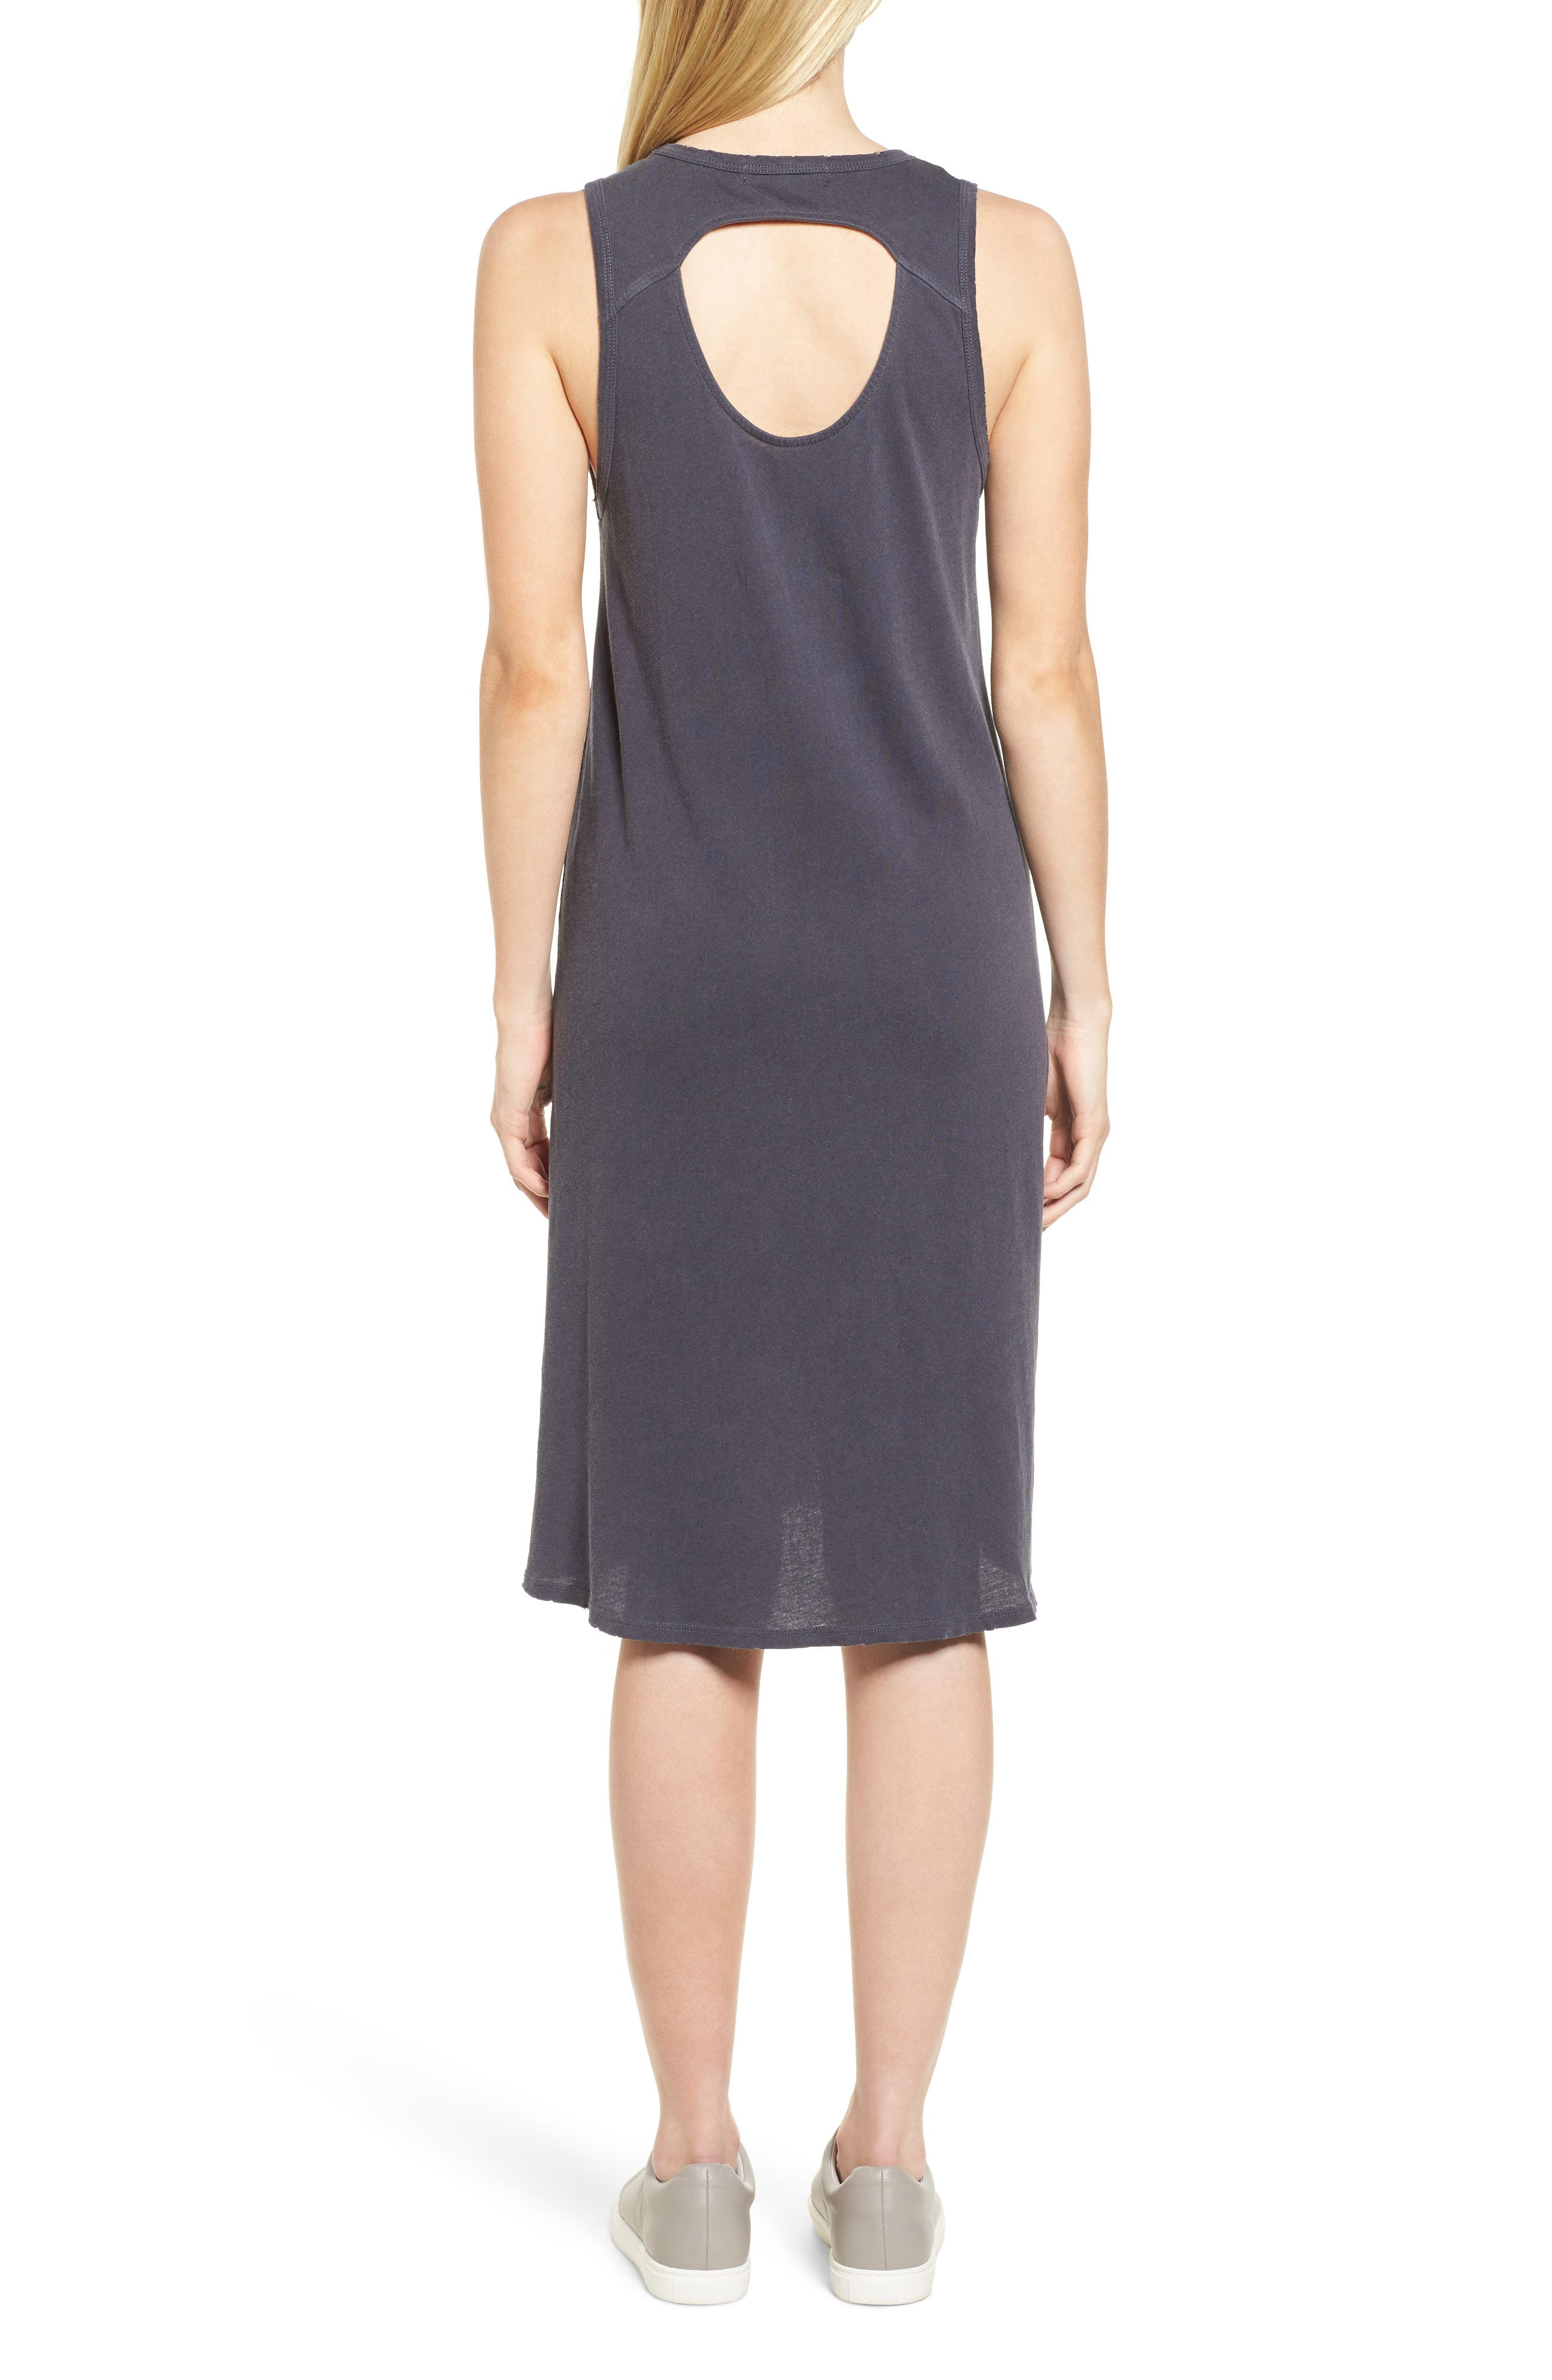 Boo Jersey Tank Dress,                             Alternate thumbnail 2, color,                             Asphalt